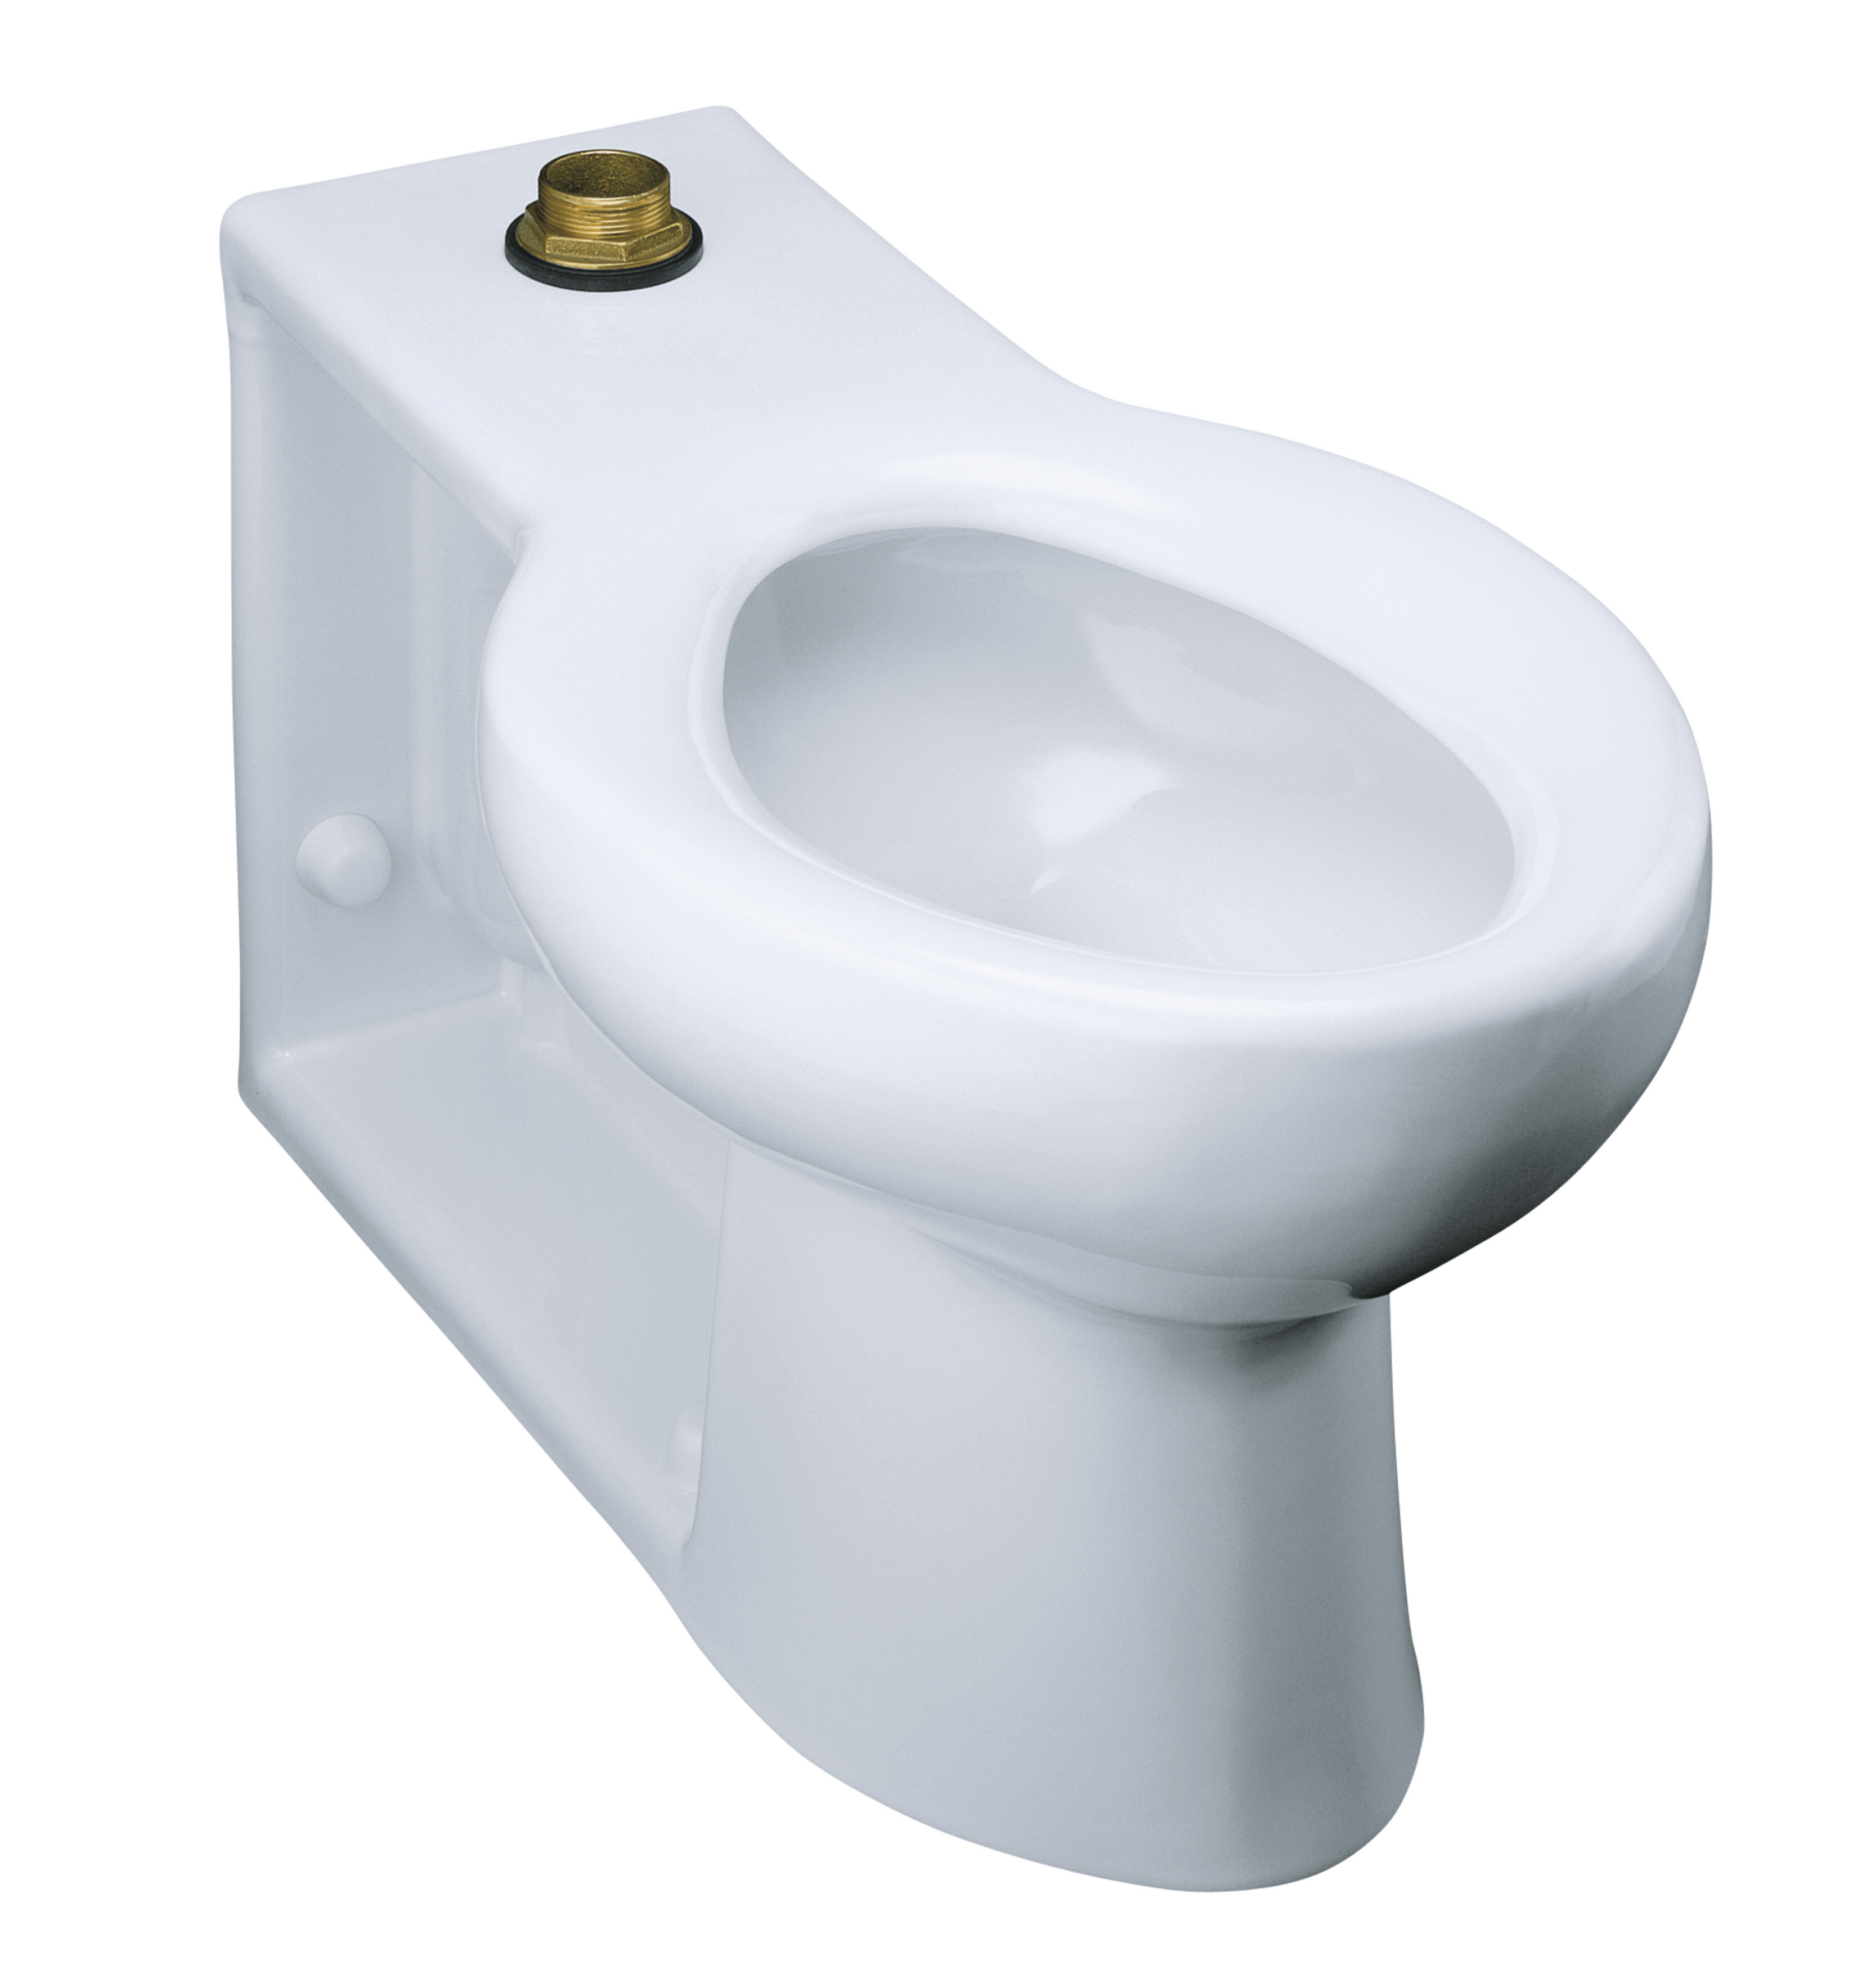 Rear Outlet Toilet | Wayfair